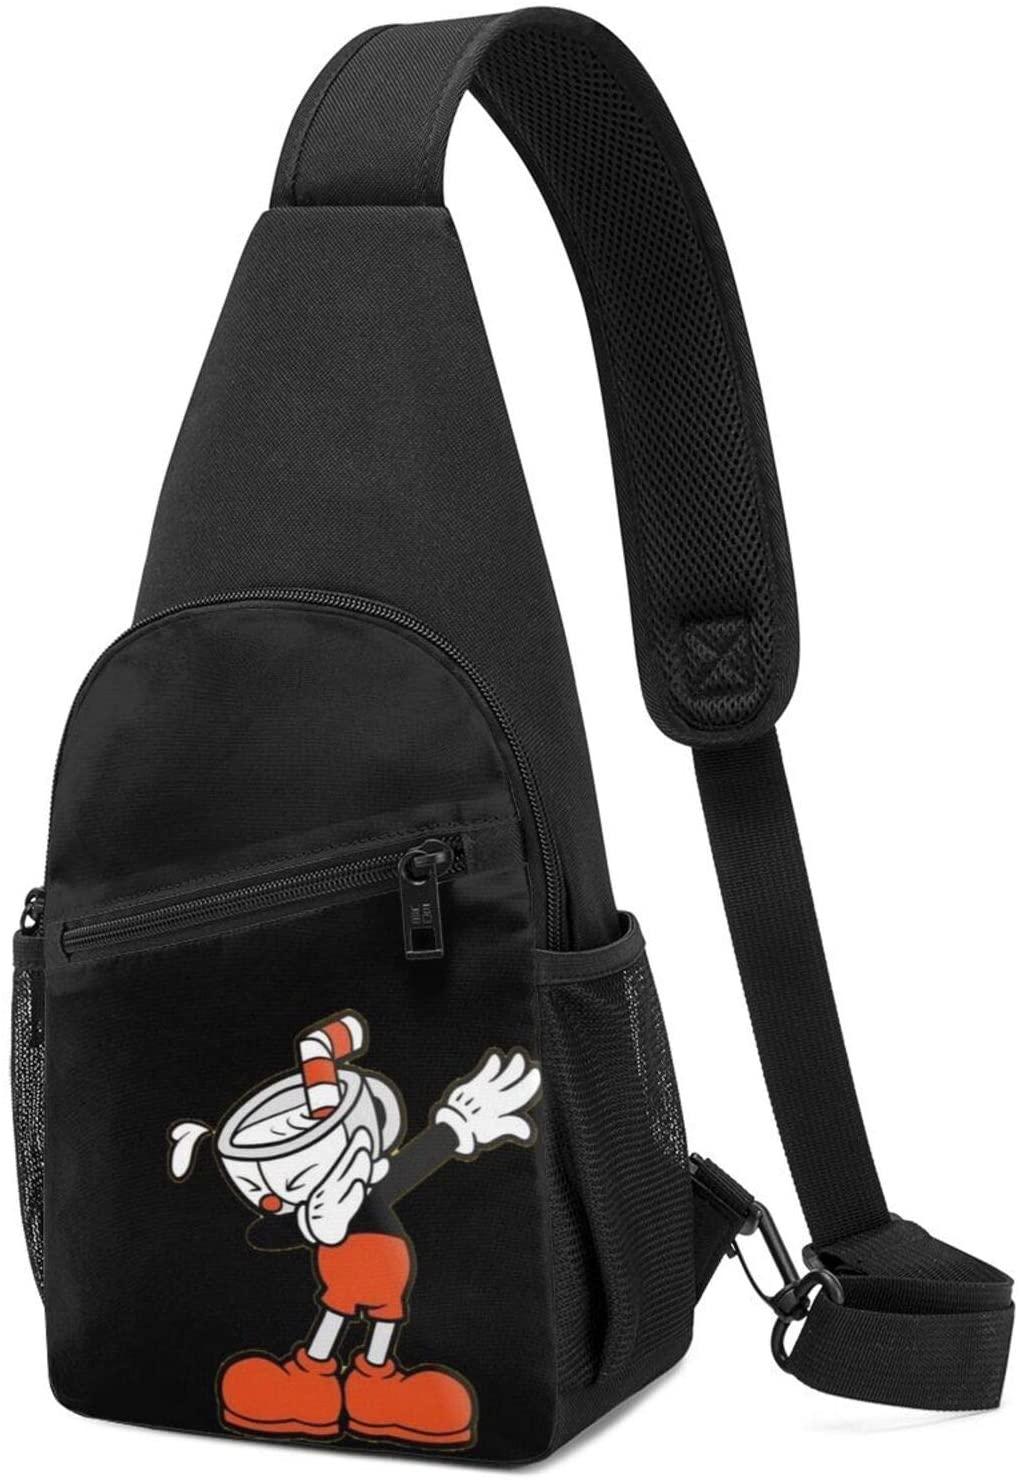 Cuphead Sling Bag Chest Bag Shoulder Backpack Cross Body Travel